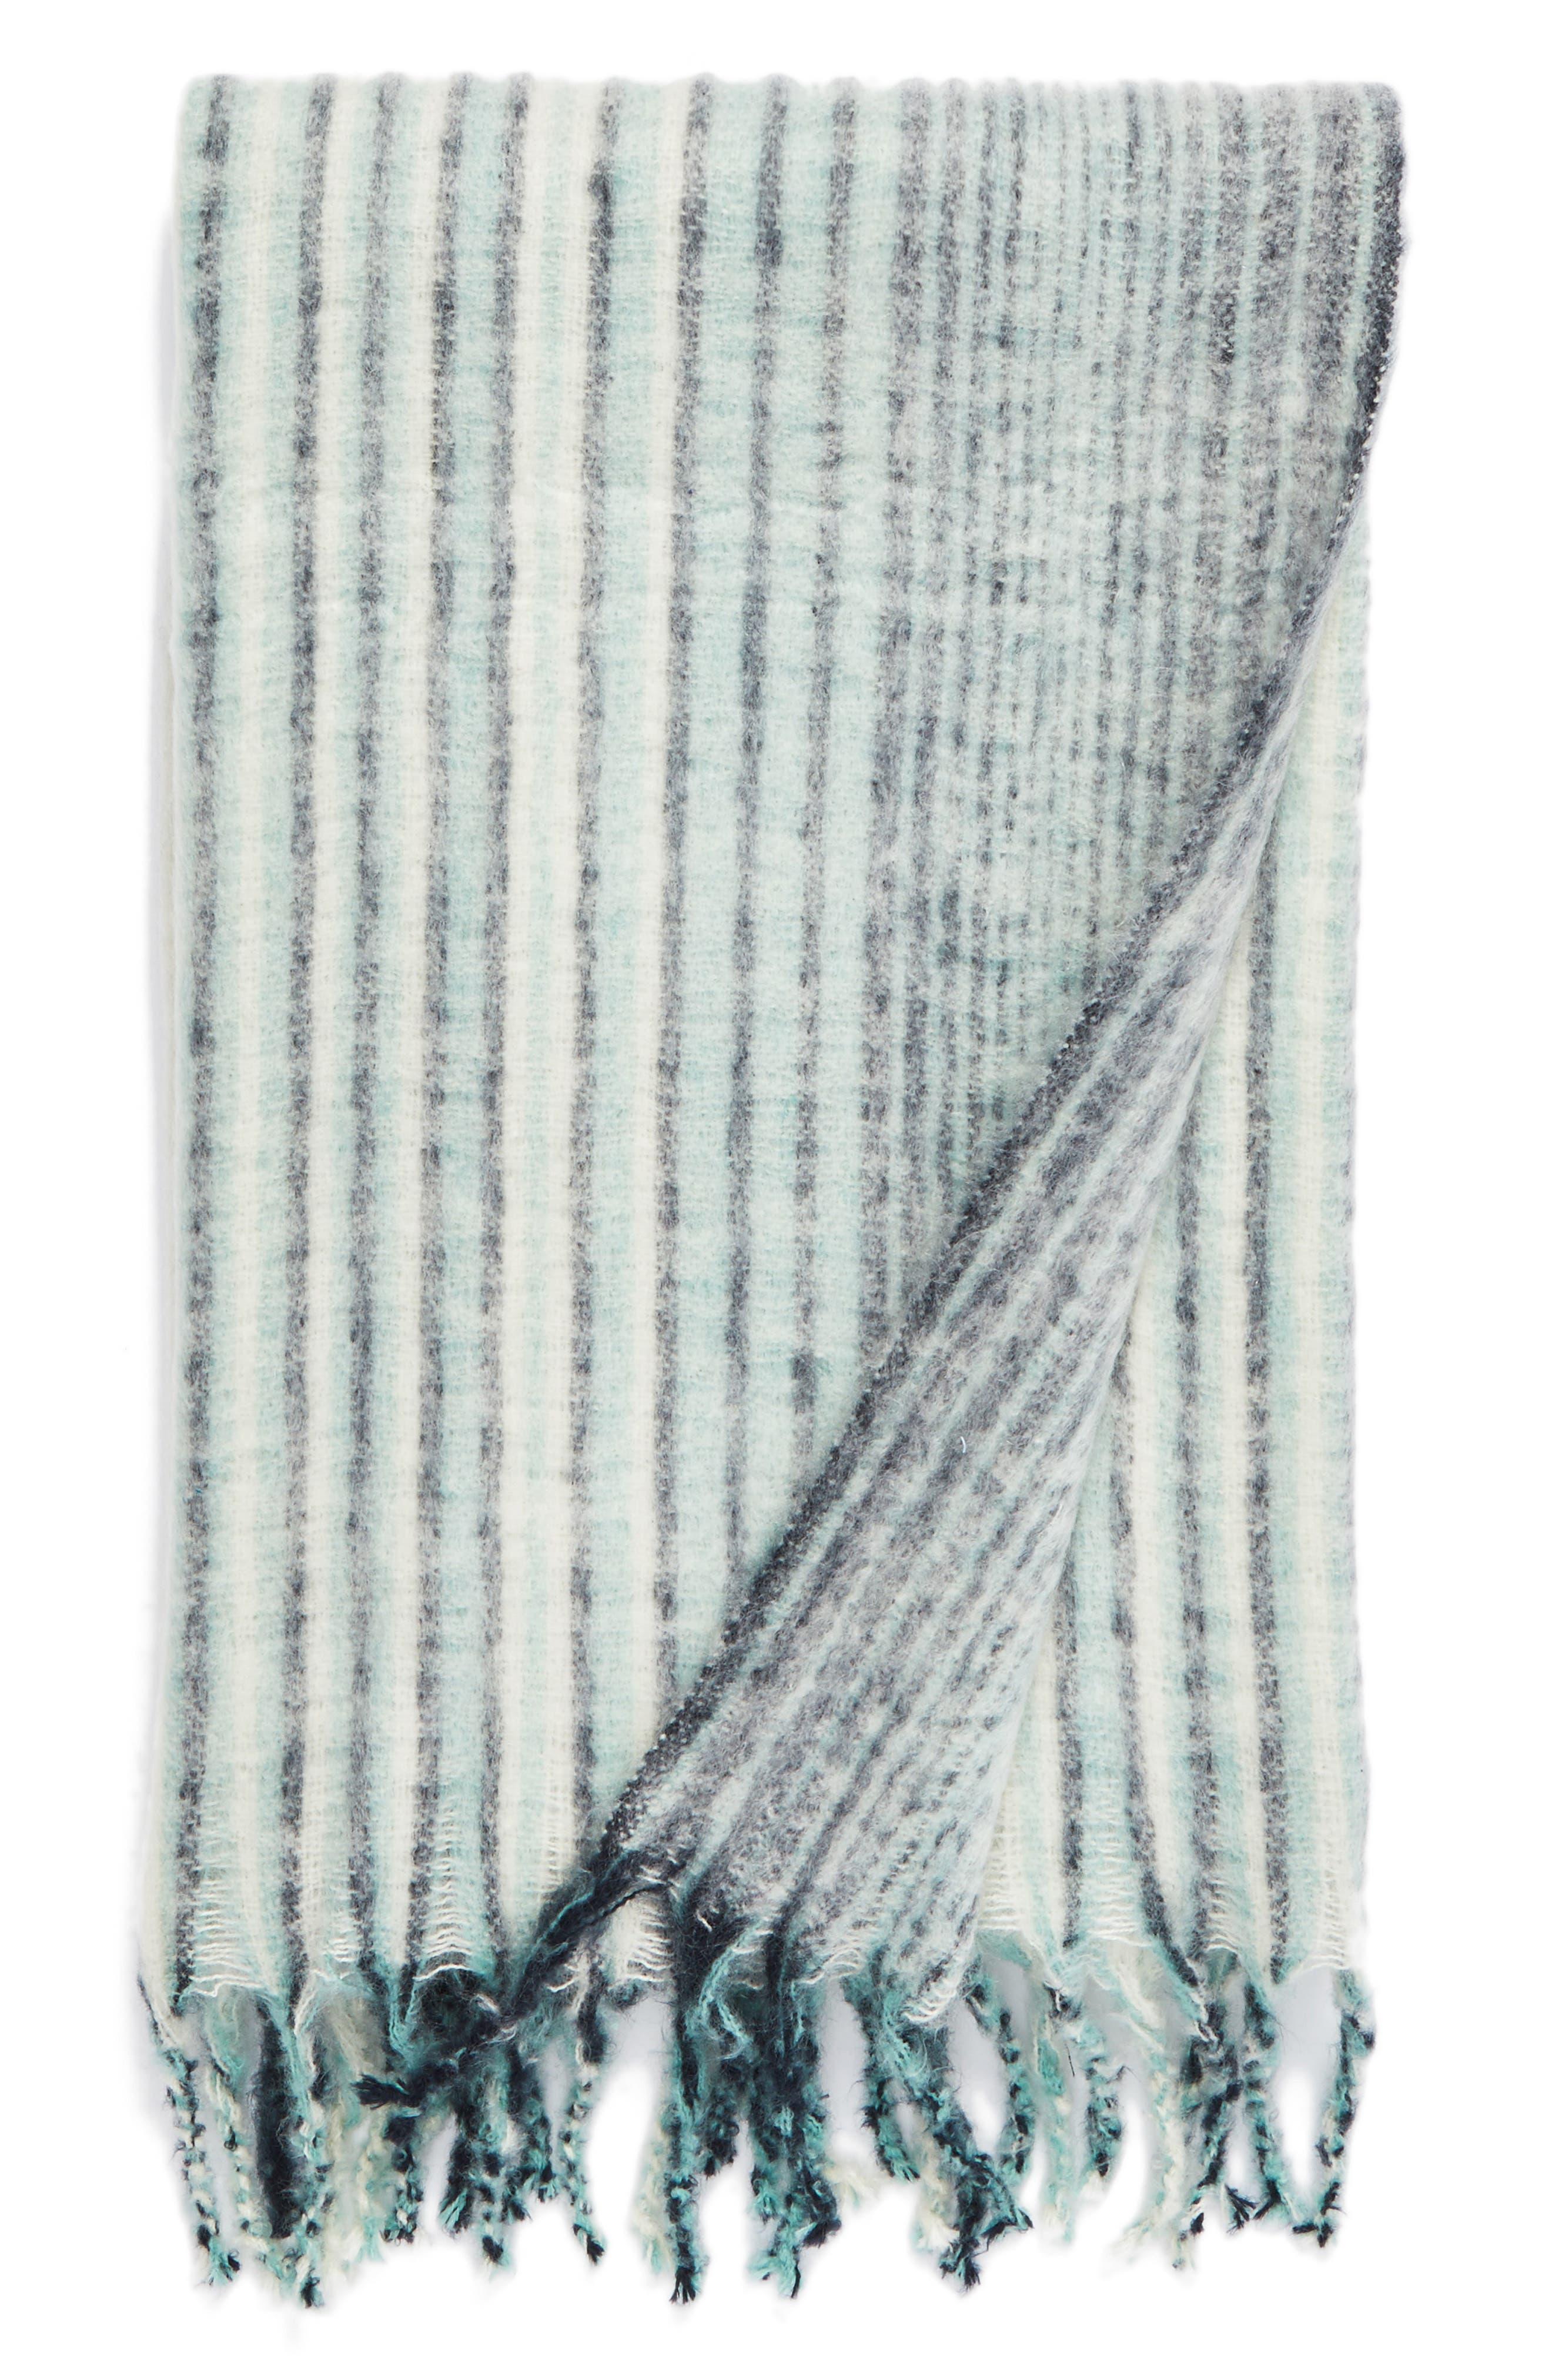 Nordstrom at Home Brushed Ombré Throw Blanket